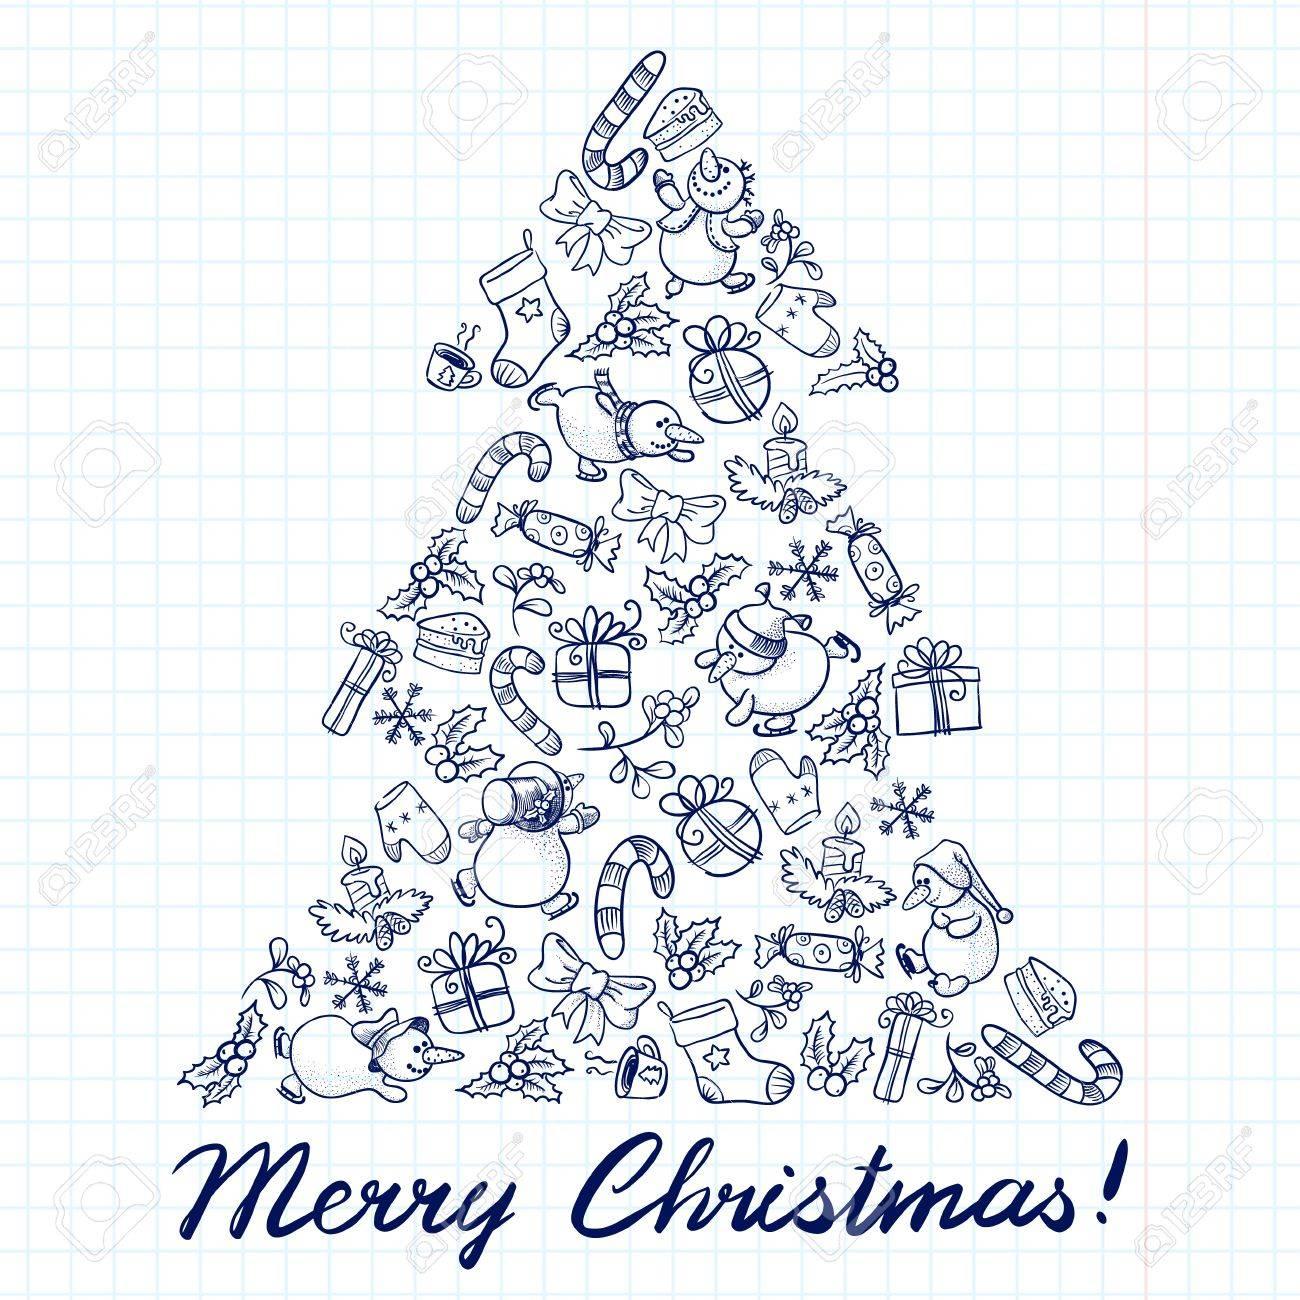 Cute doodle Christmas tree shape Stock Vector - 16503863